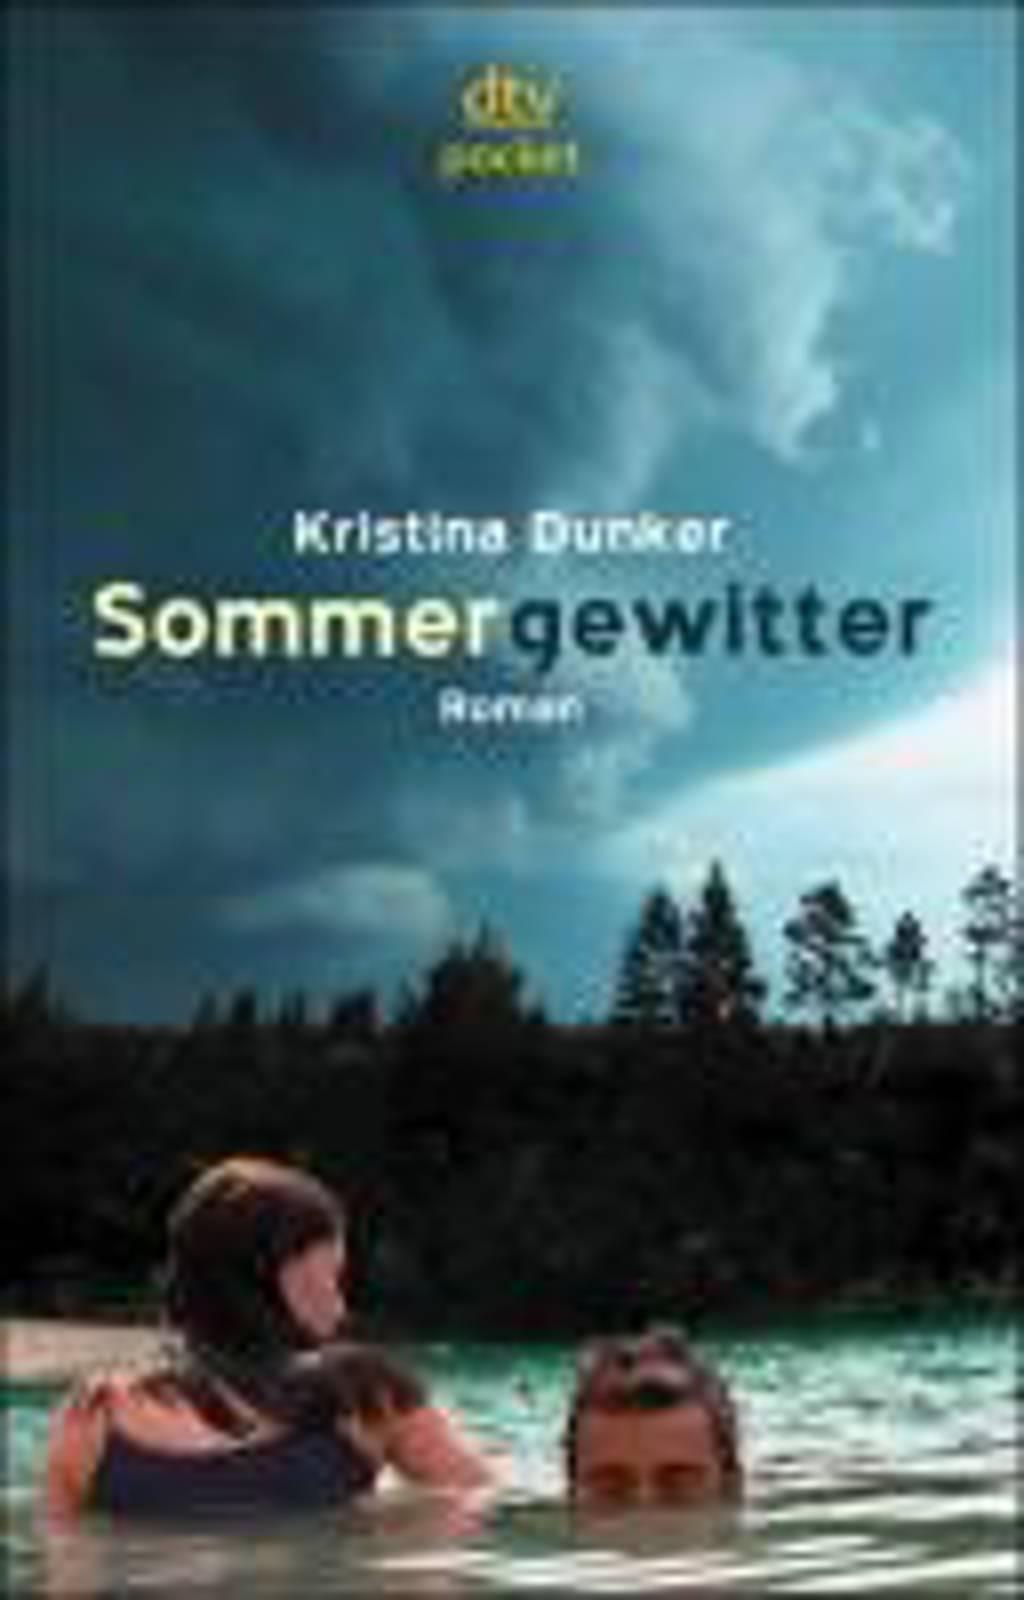 Sommergewitter - Dunker, Kristina